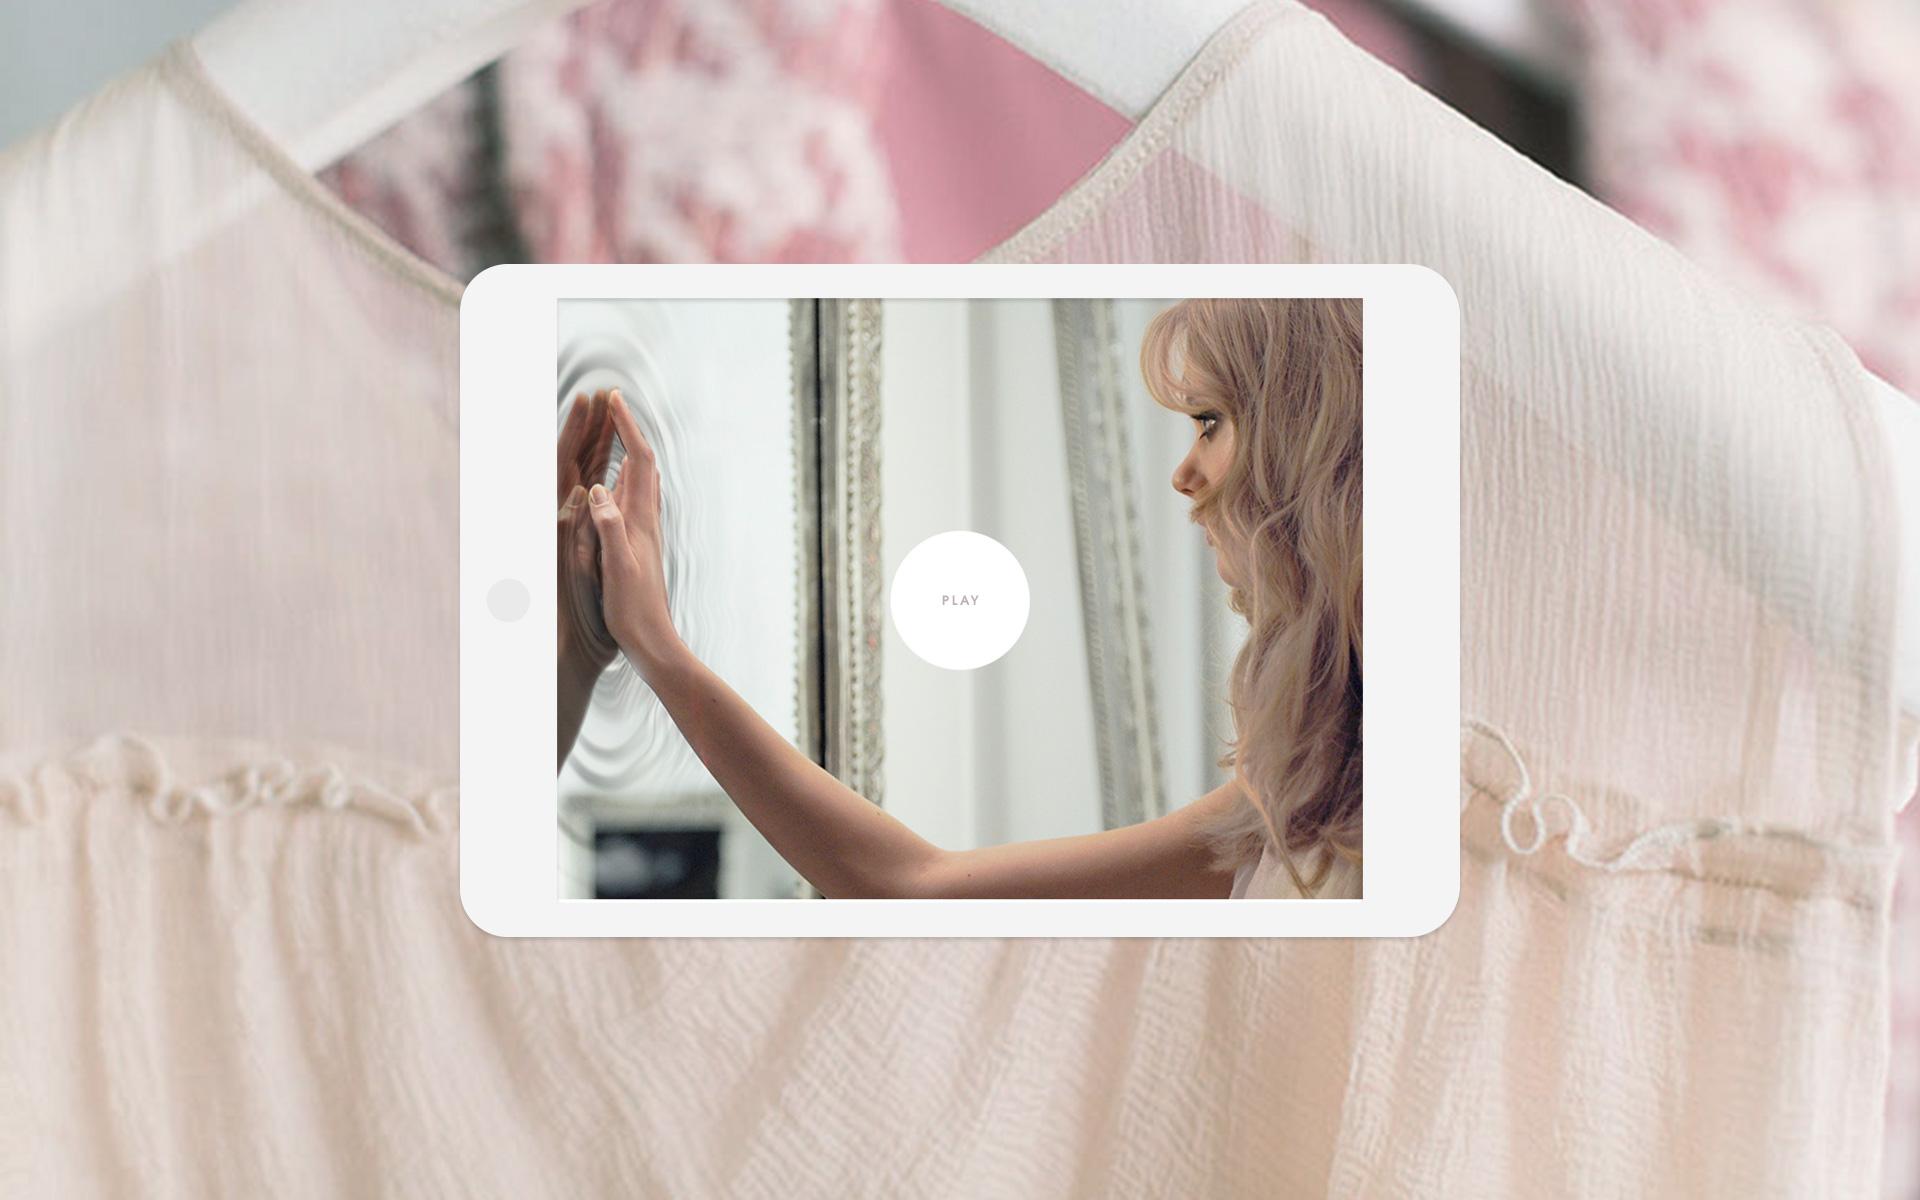 helene-chataigner-nina-web-design-screen-06-big